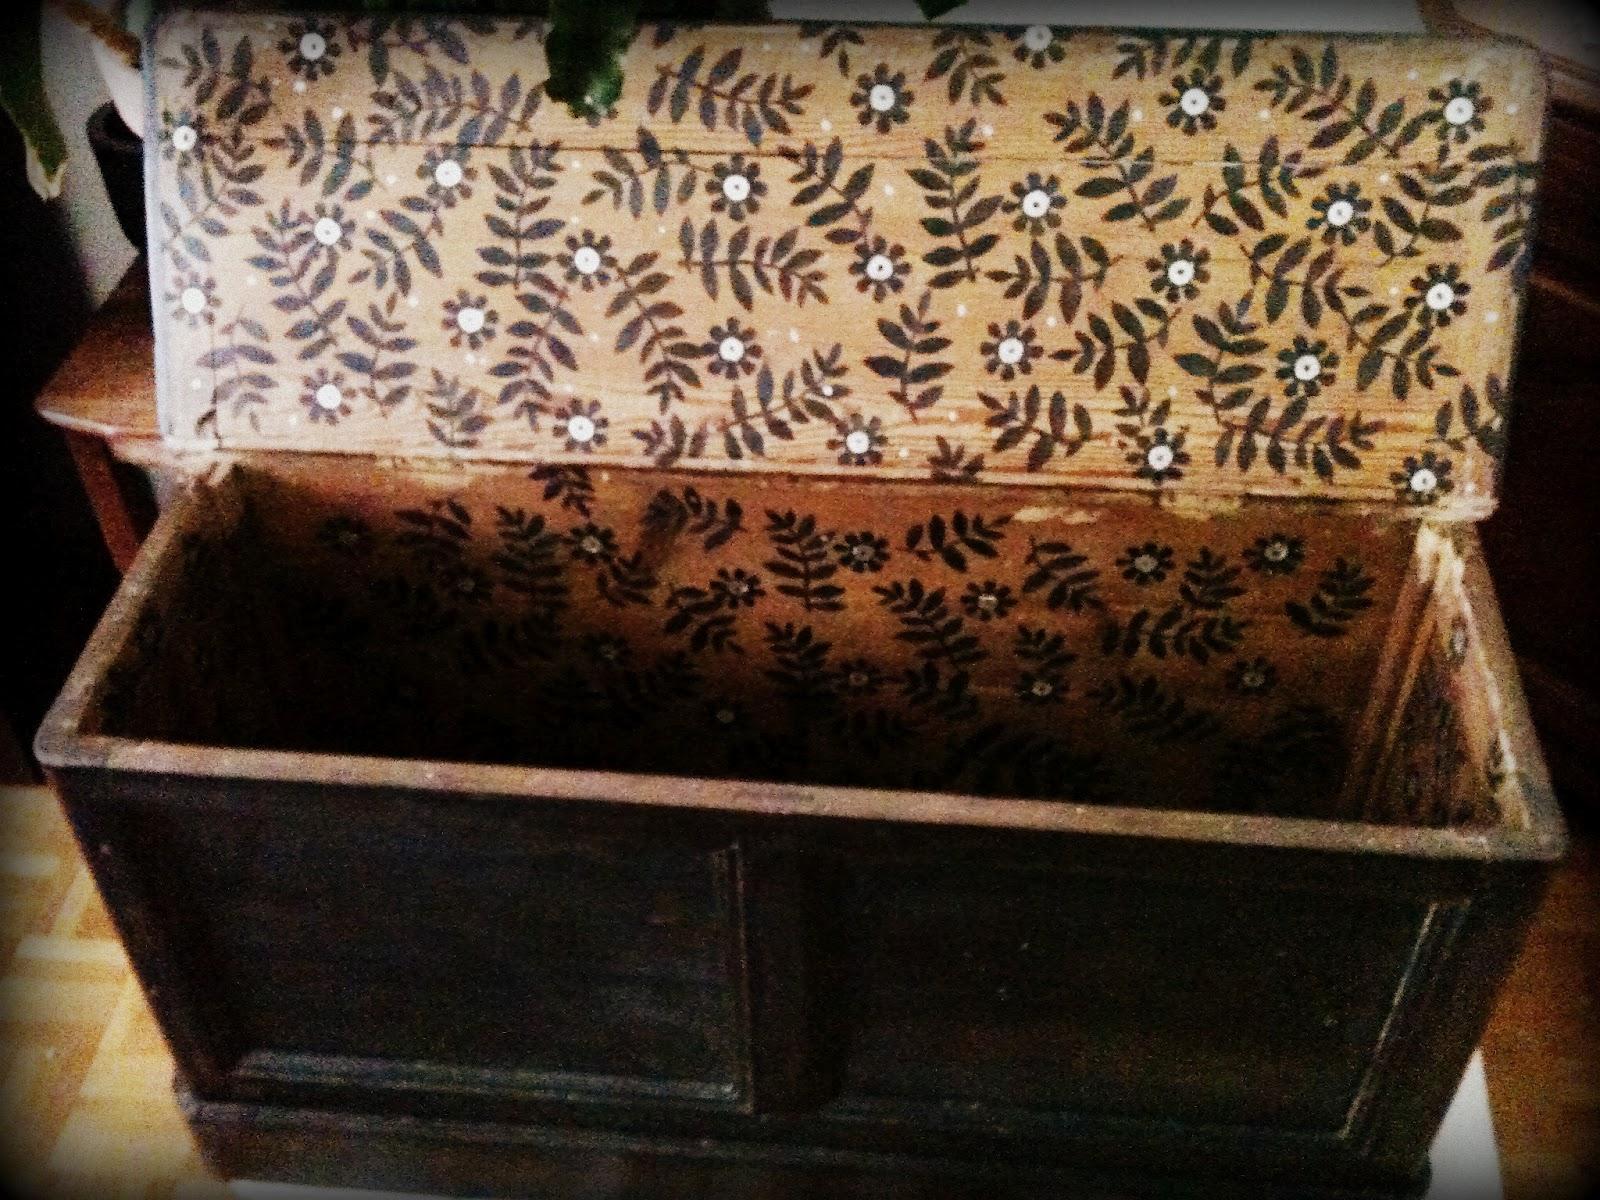 Toti t a toti un tresor de coffre - Coffre en bois a peindre ...